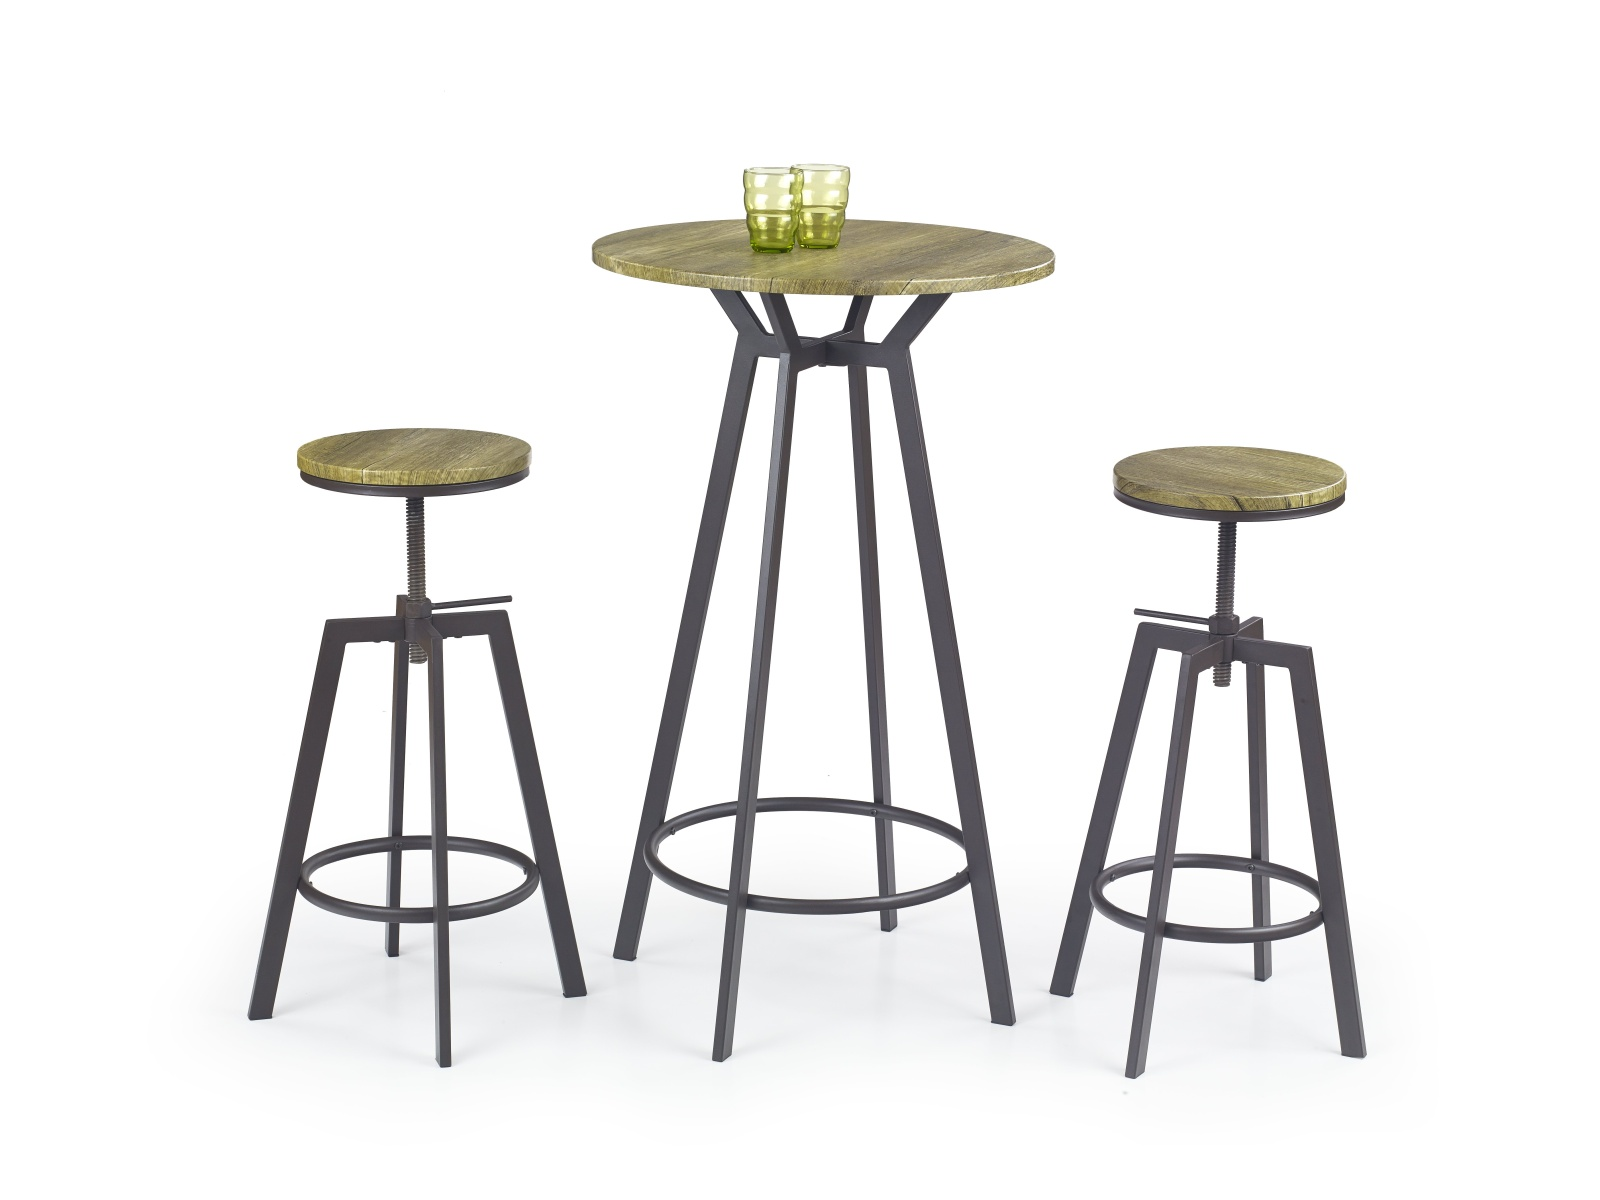 Halmar Barový stolek SB 9, old vasion/coffee